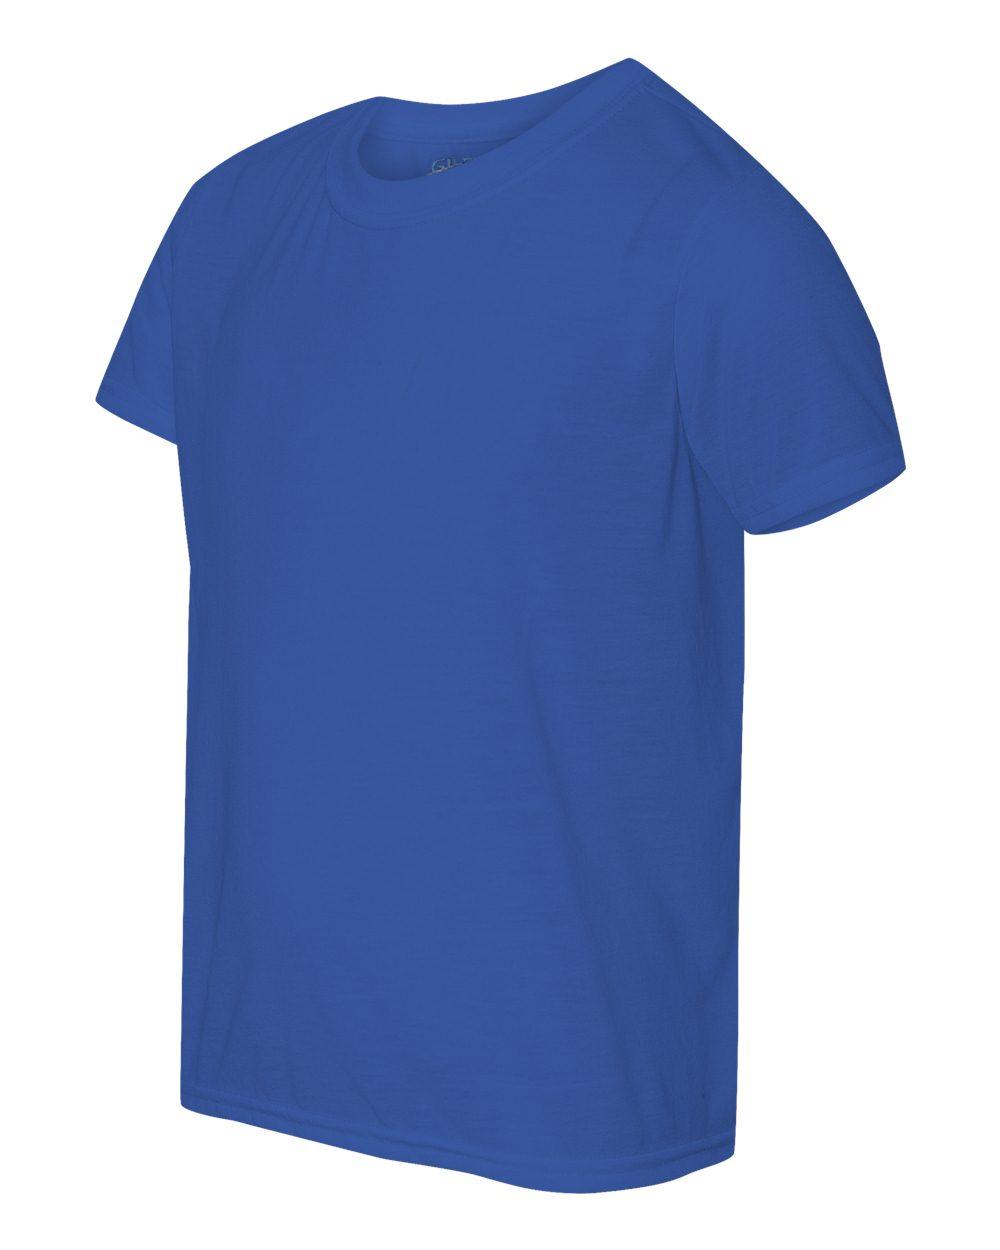 Gildan 42000b performance youth t shirt friendly for Kids t shirt printing